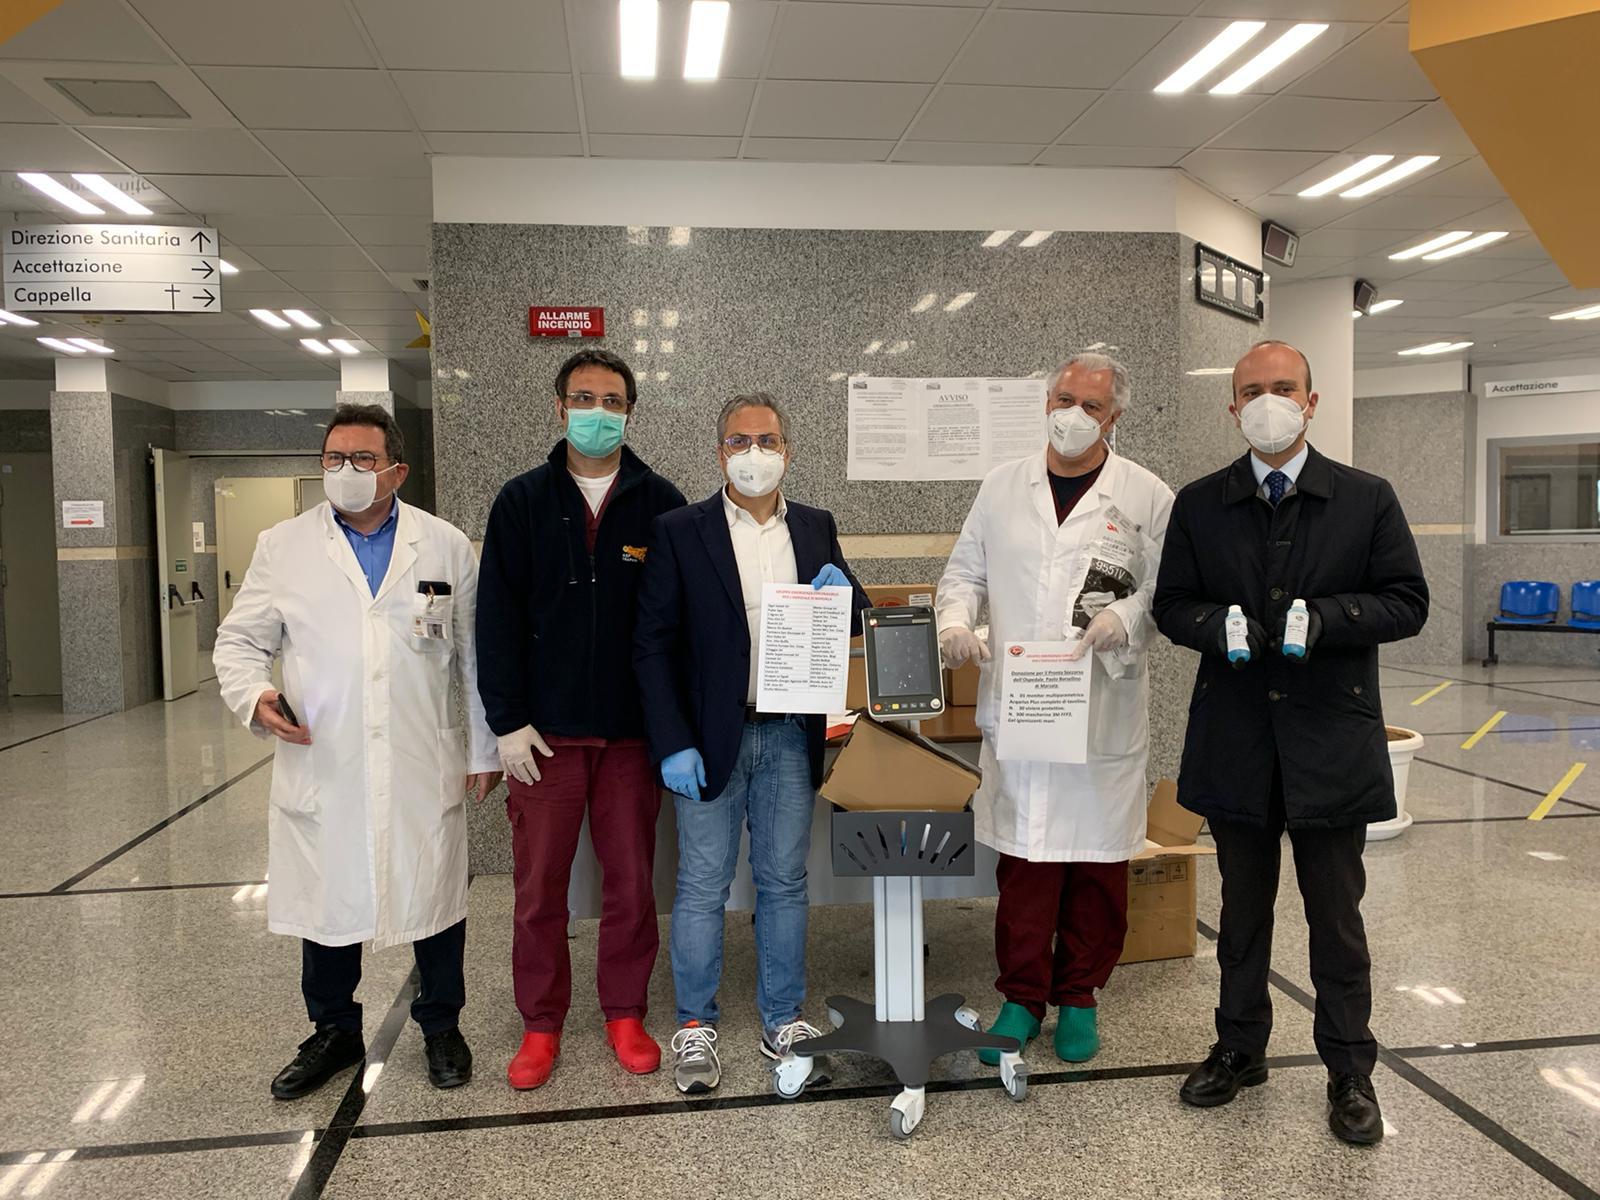 Ospedale Marsala: imprese ed imprenditori donano Totem Multiparametrico, visiere e gel disinfettante